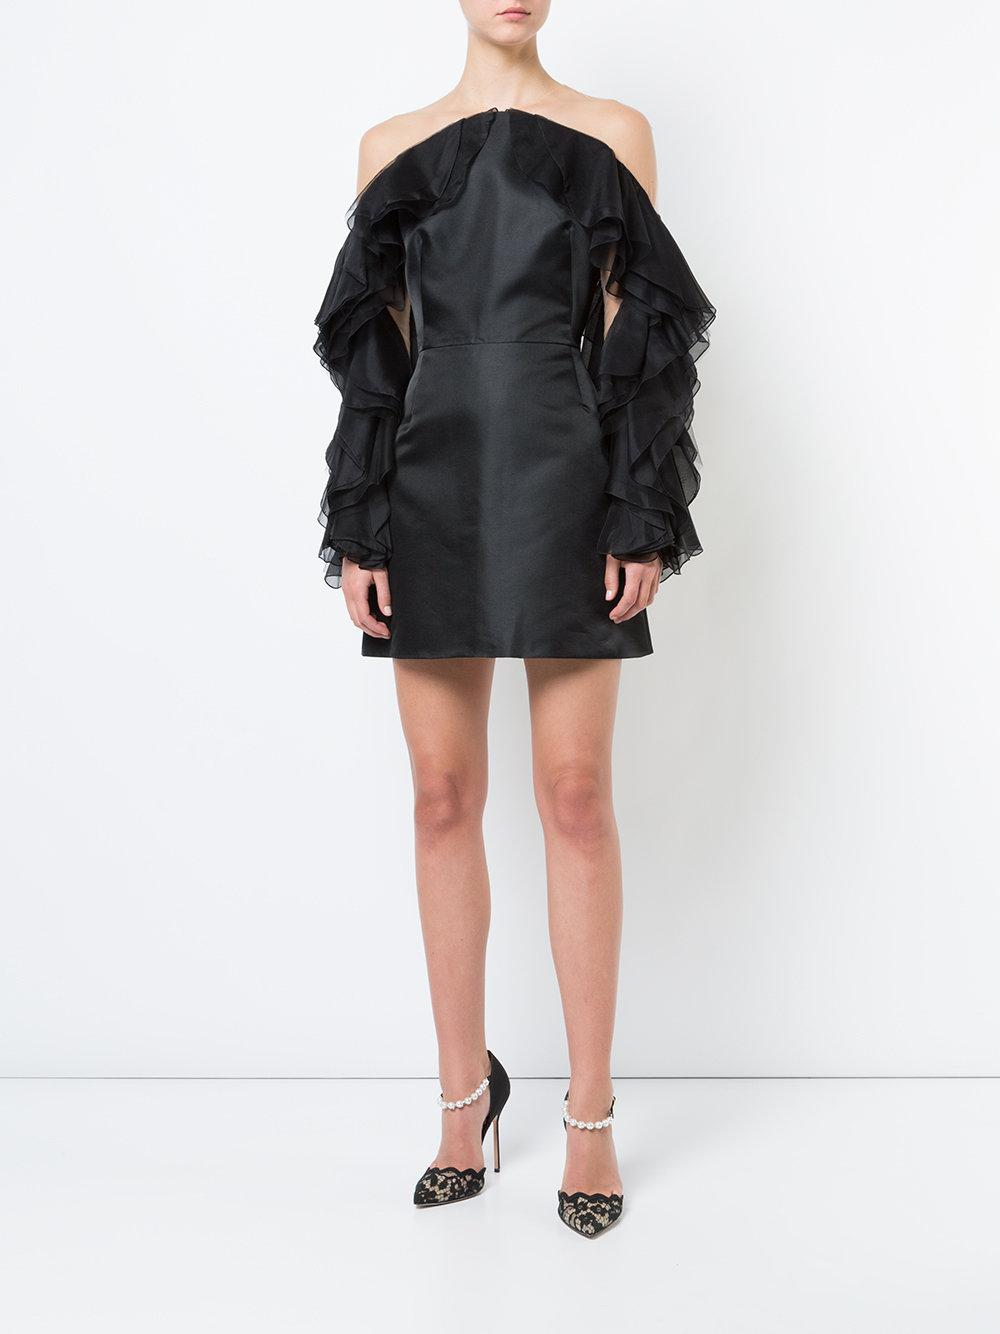 ruffle-sleeve fitted dress - Black Marchesa nNlVEfSc58